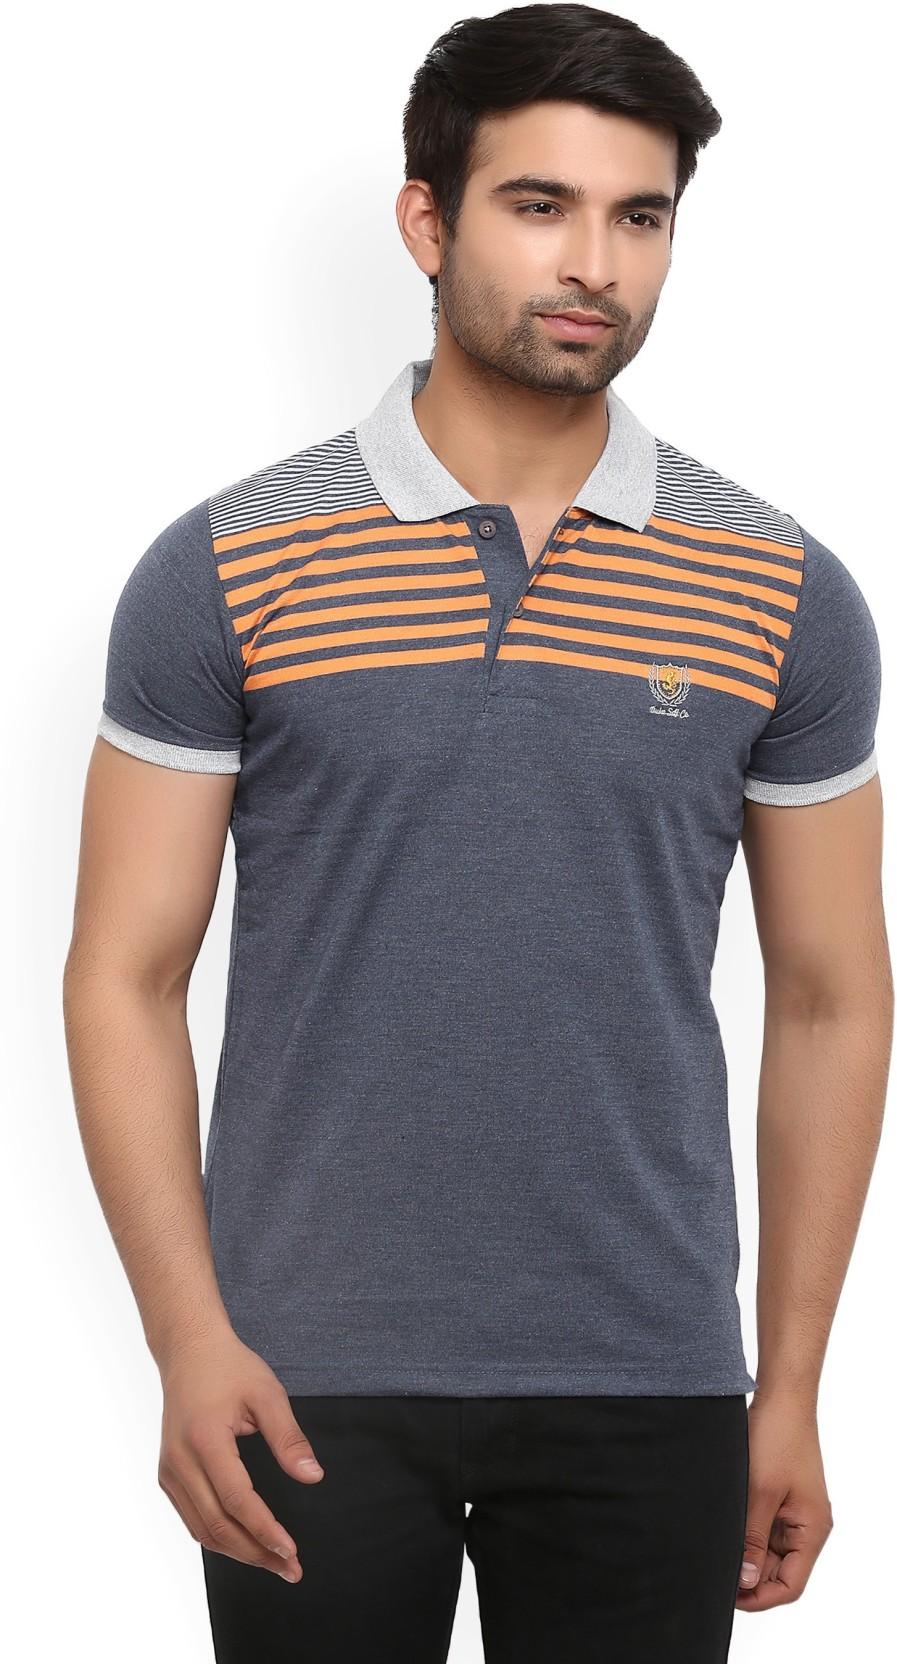 Duke Striped Mens Polo Neck T Shirt | Azərbaycan Dillər